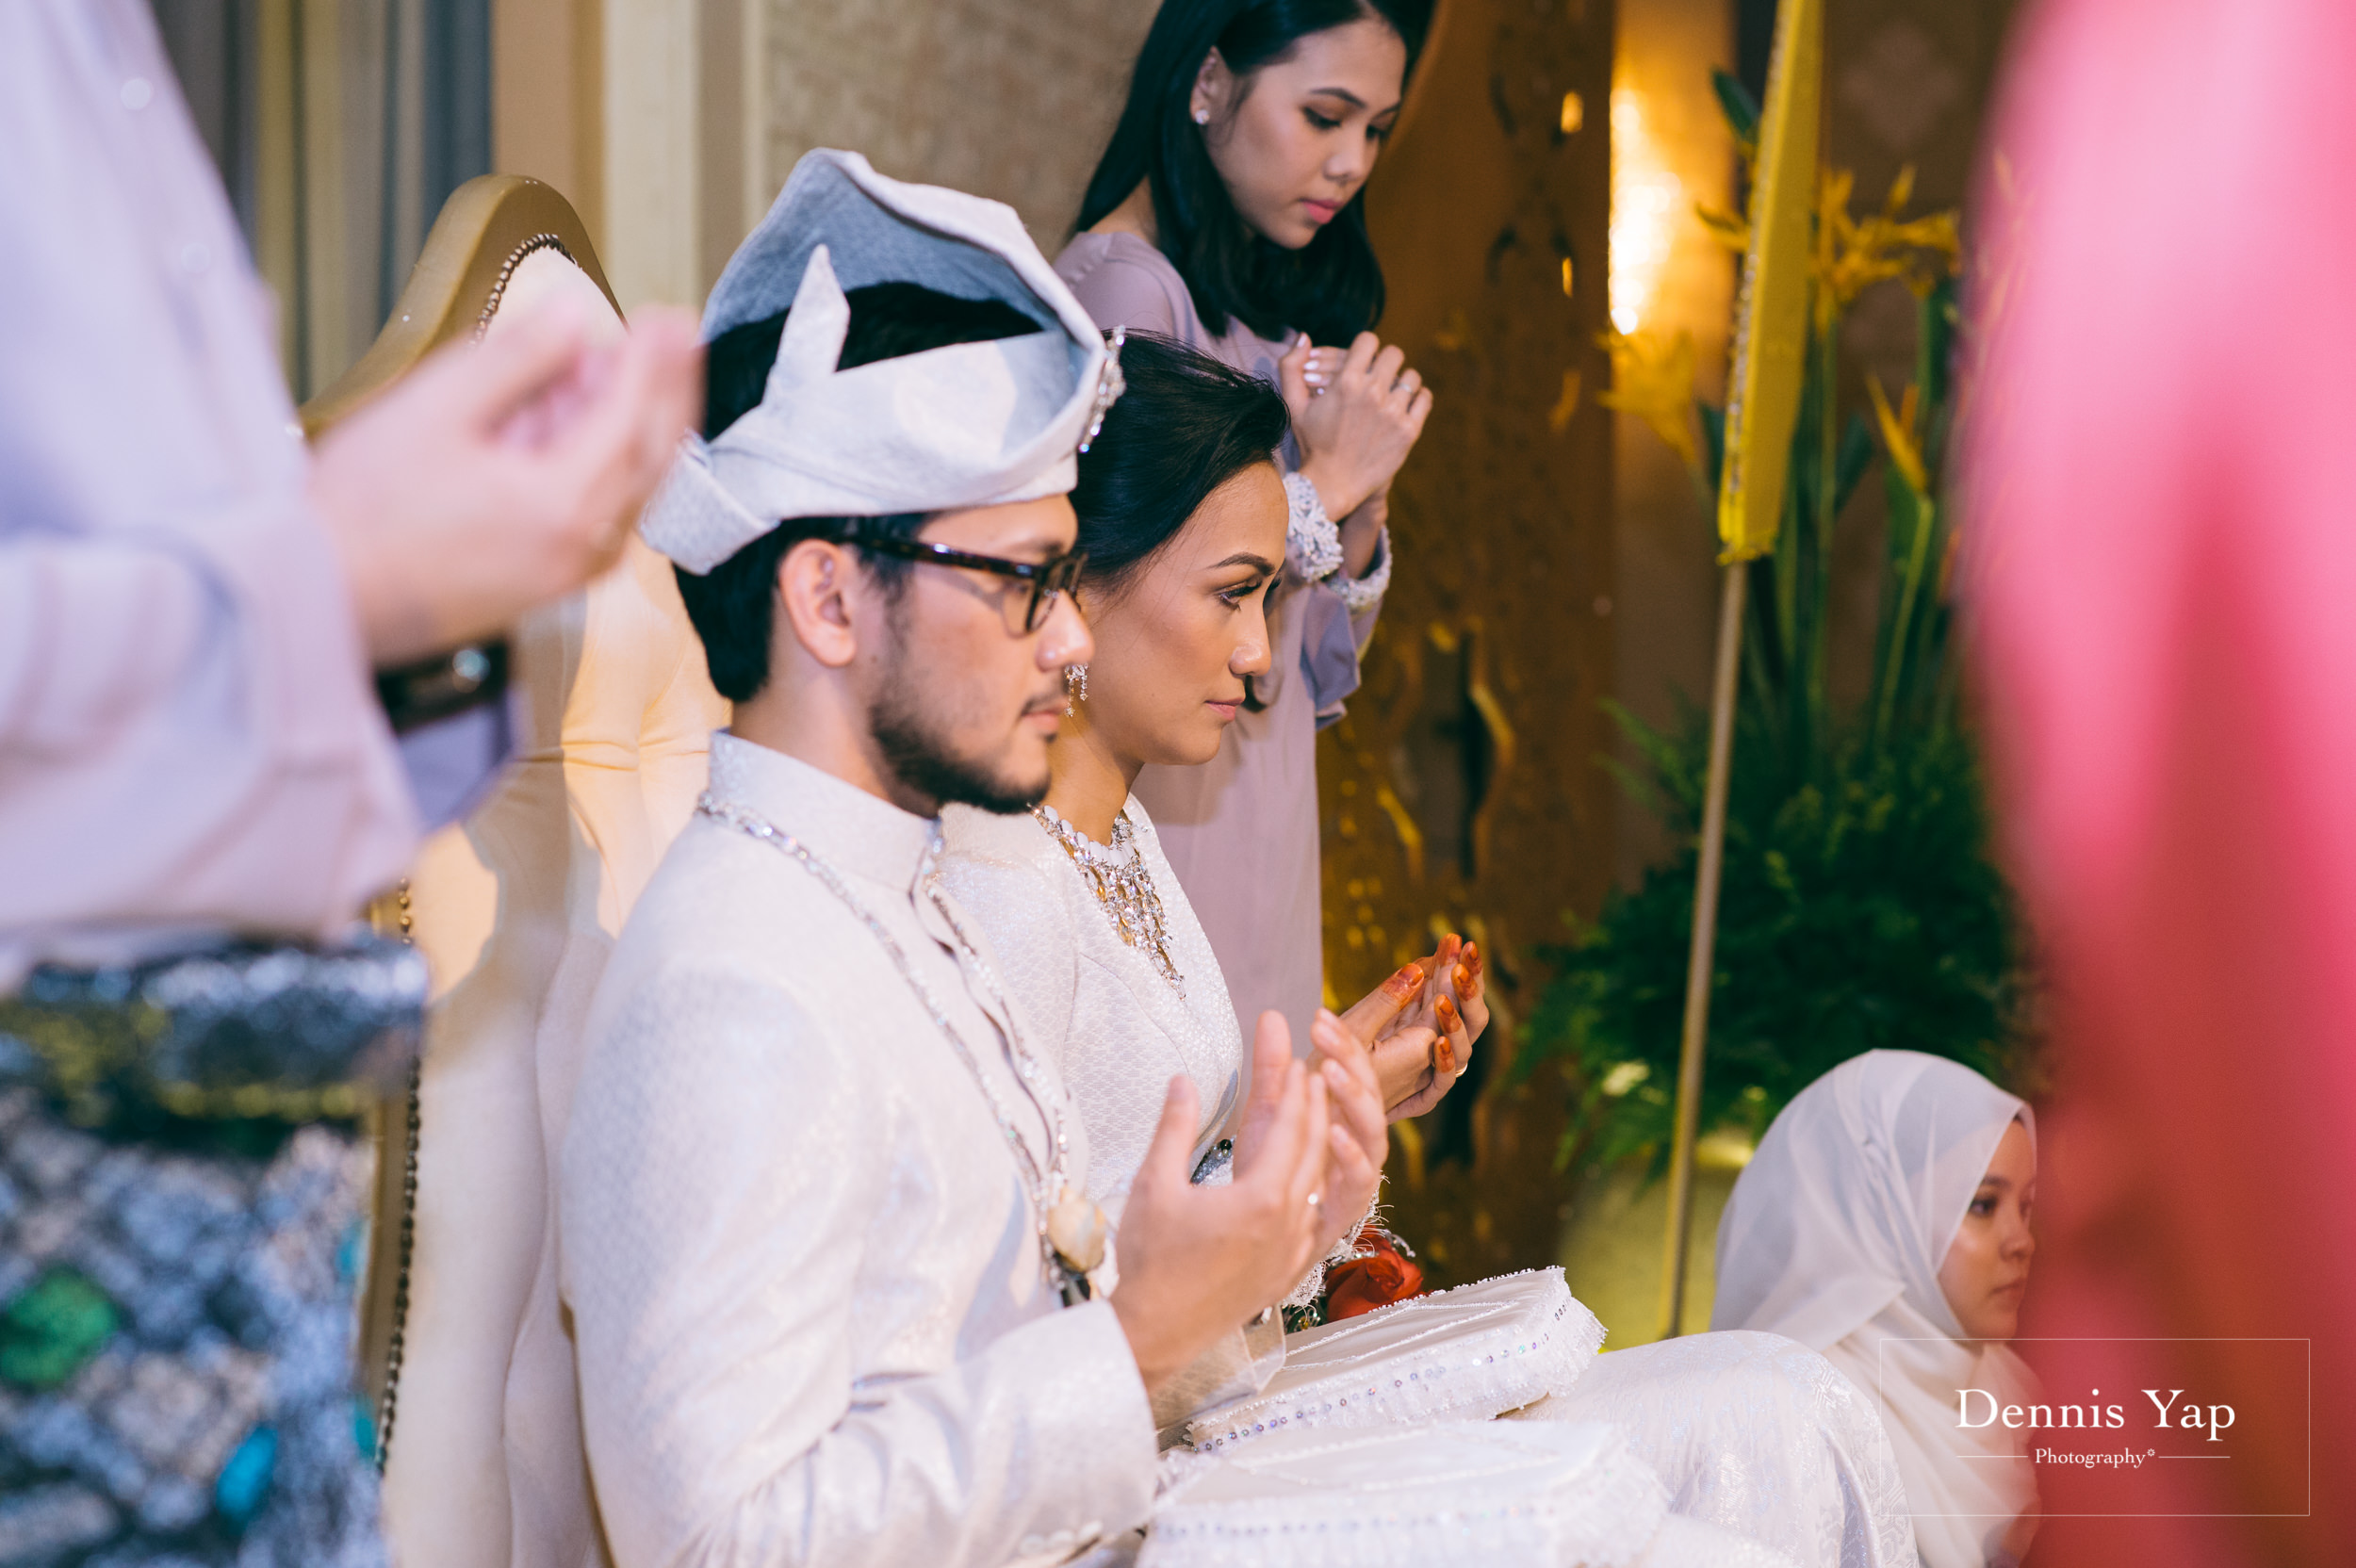 zarif hanalili malay wedding blessing ceremony dennis yap photography-14.jpg